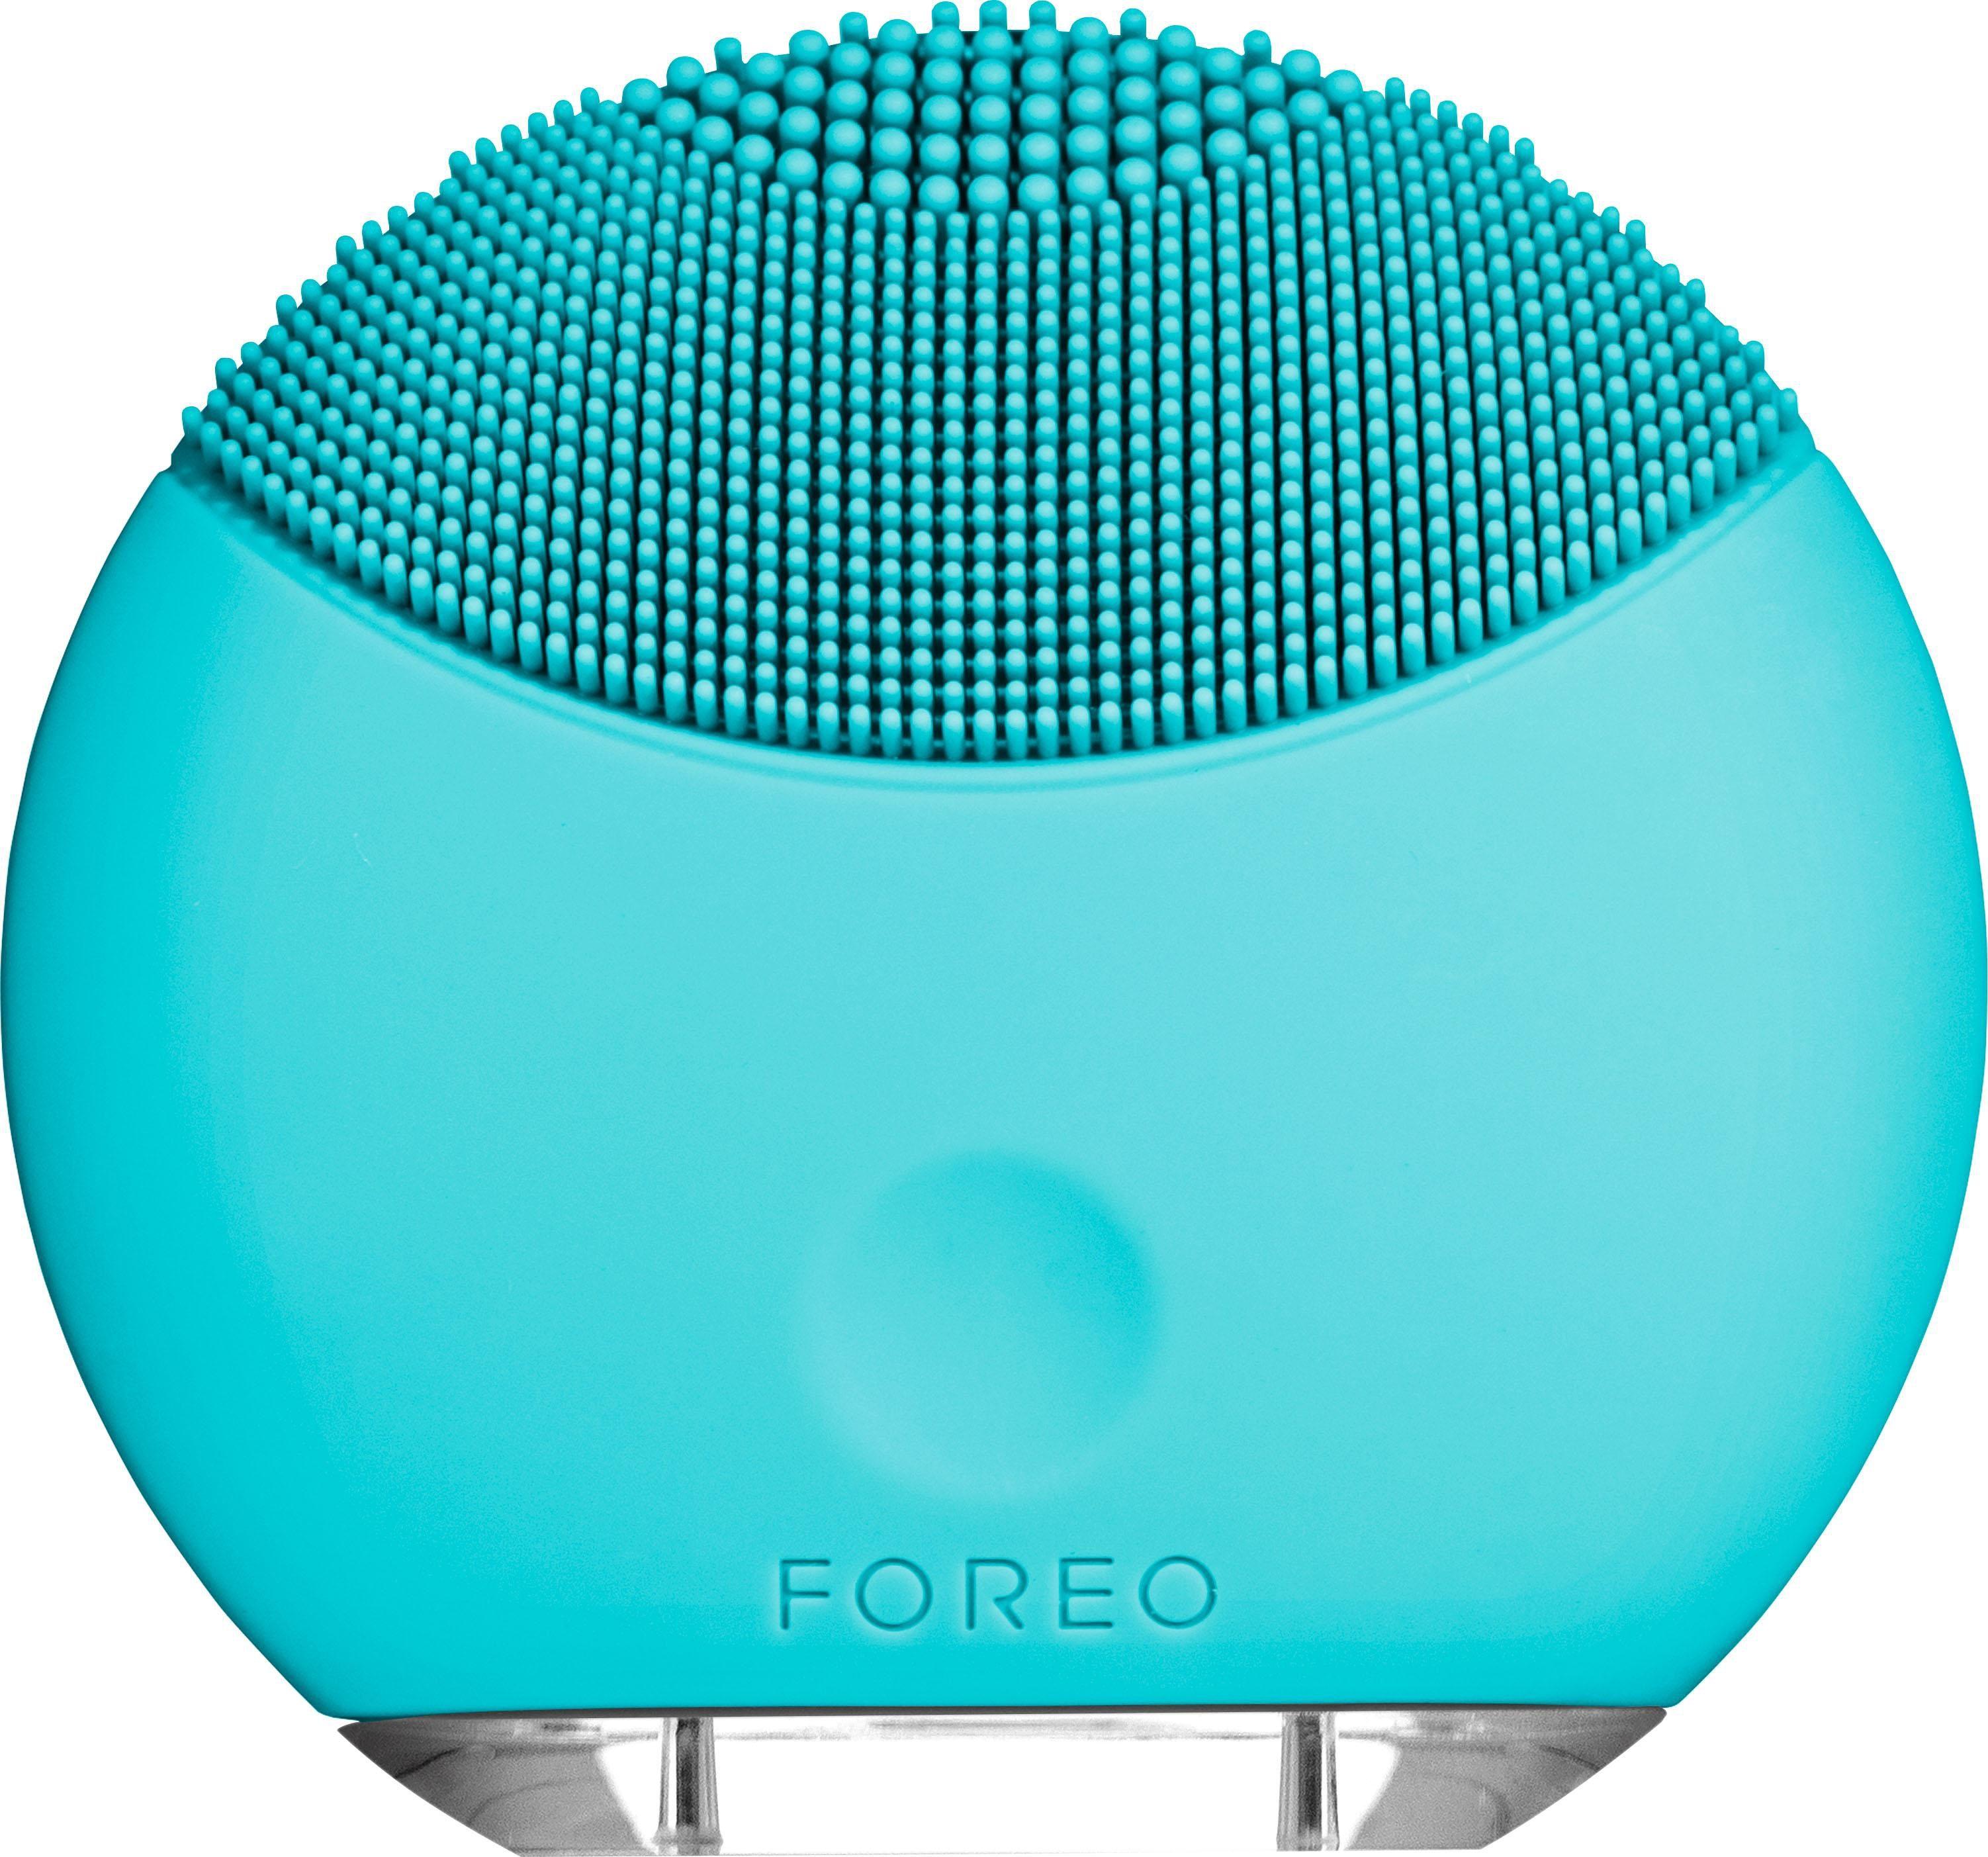 Foreo Gesichtsreinigungsbürste LUNA™ mini Turquoise Blue, kompakt & stylish